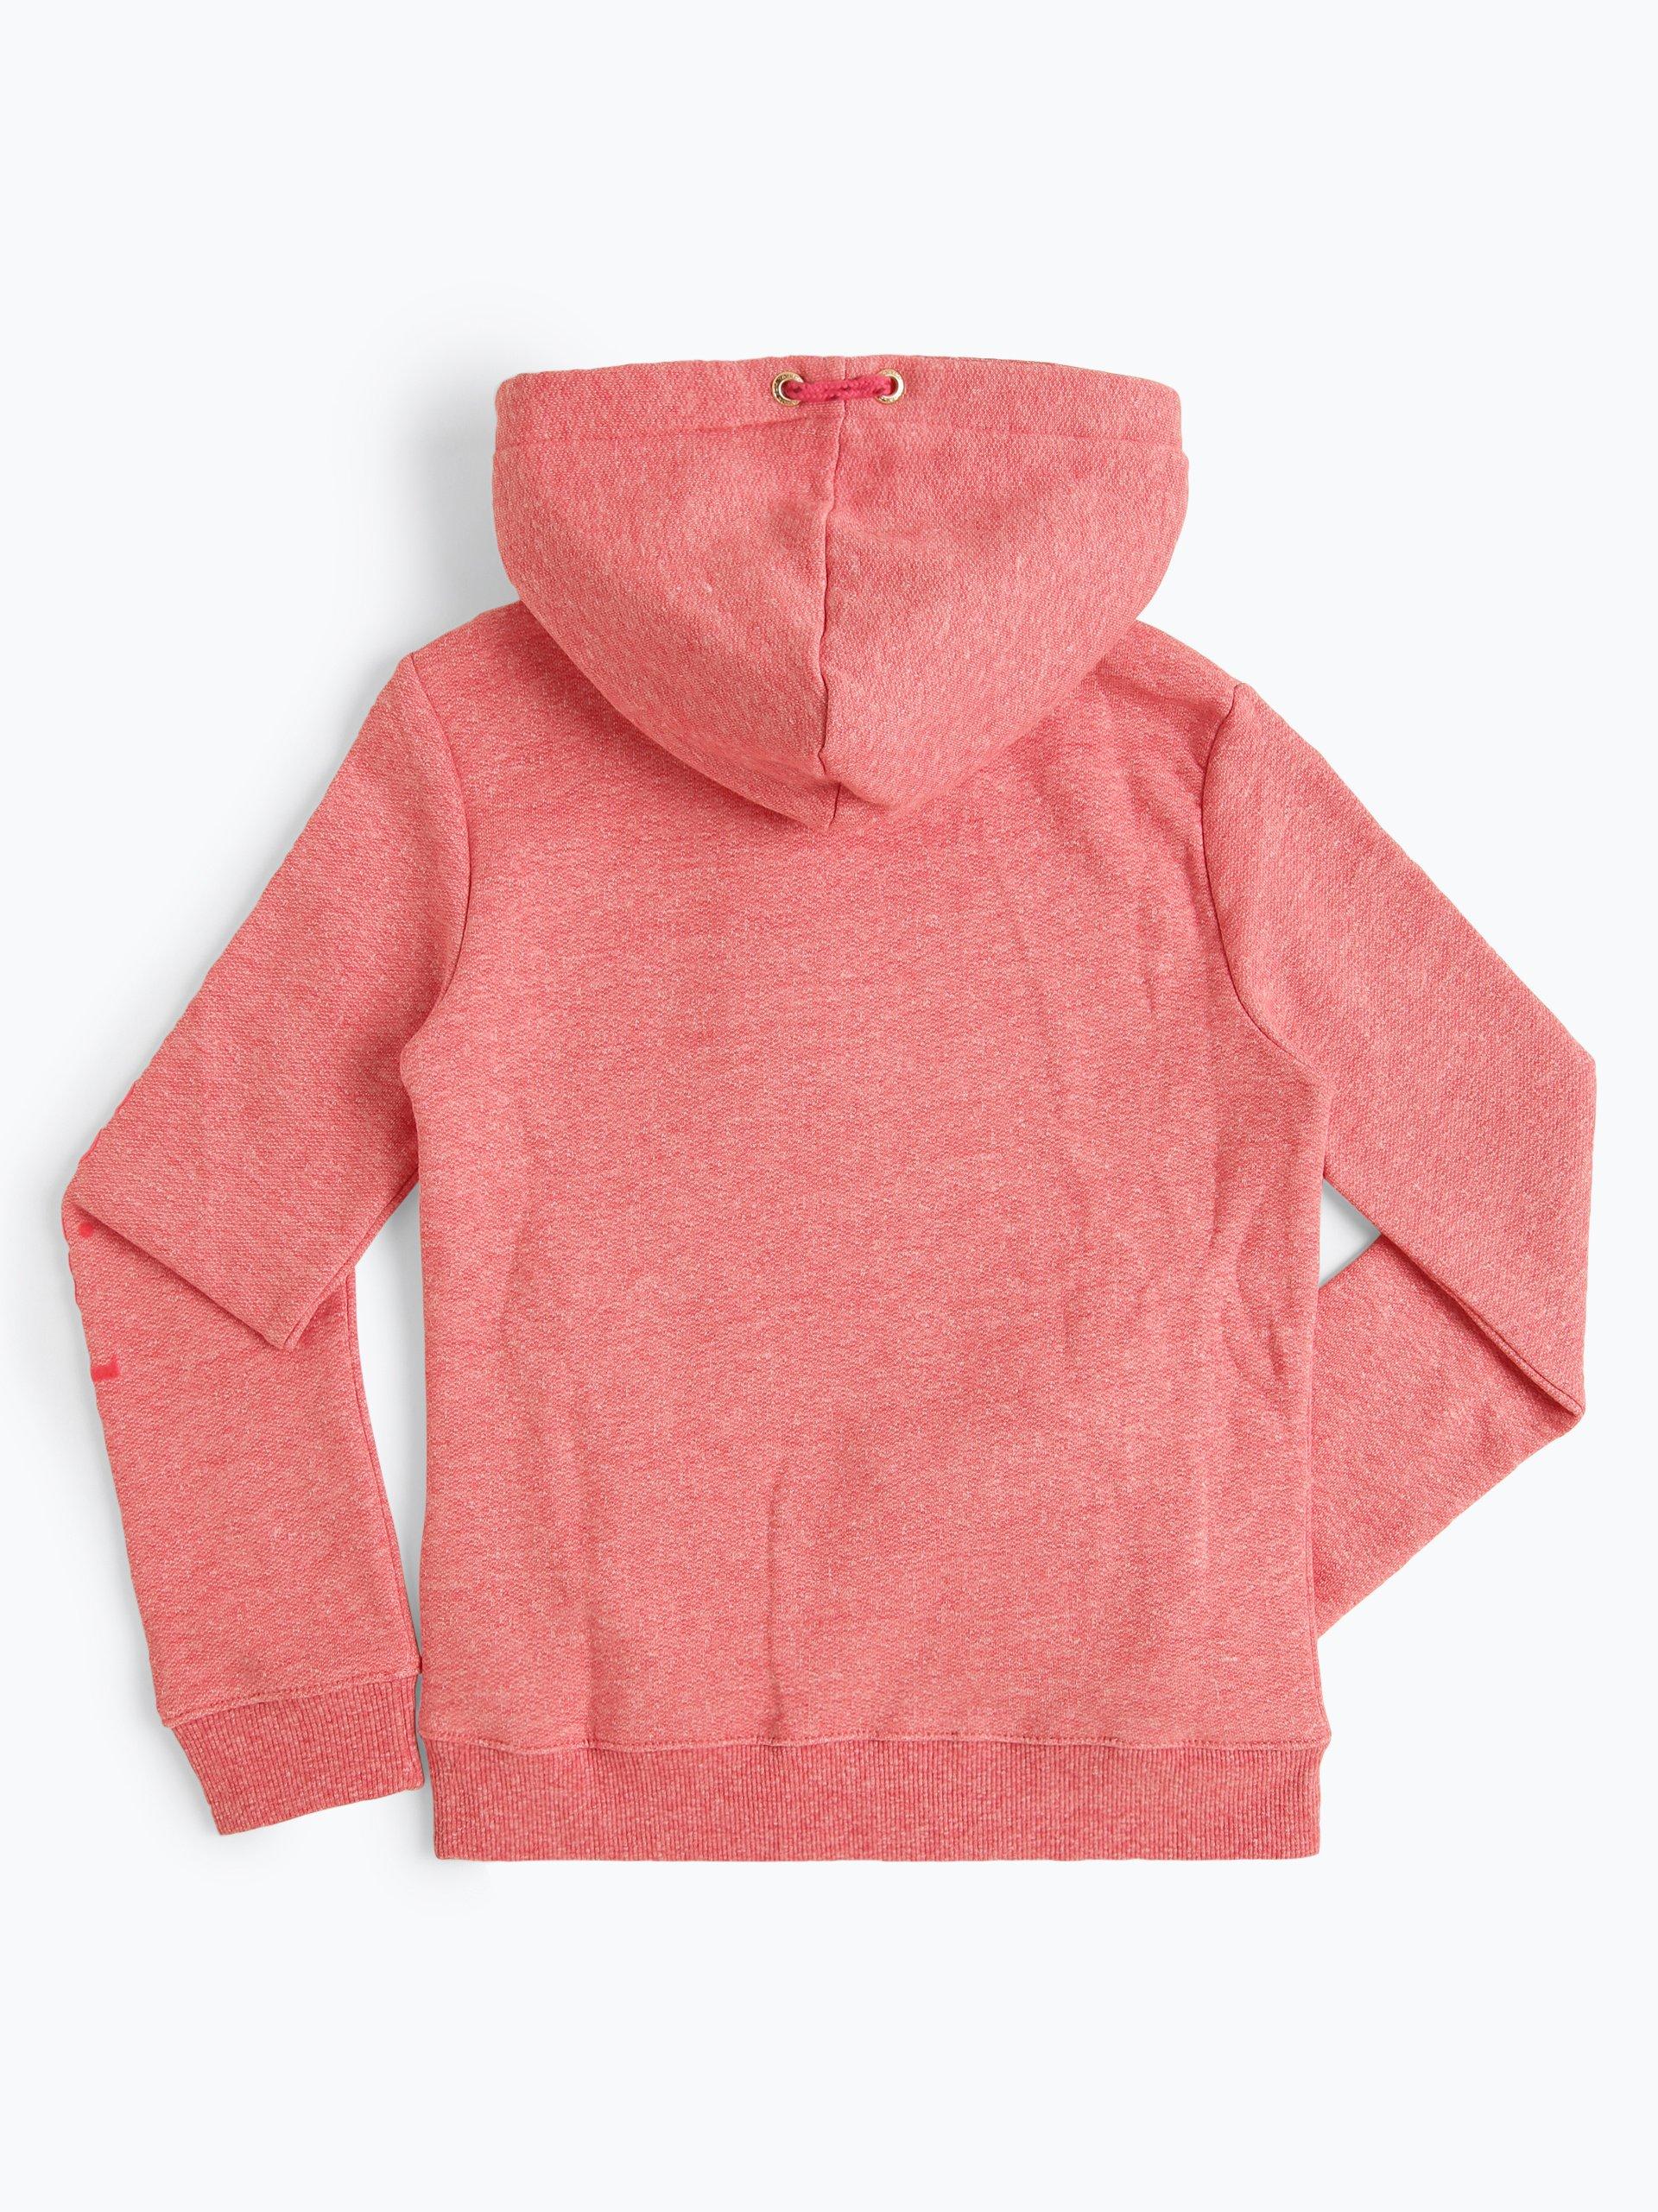 Tom Tailor Mädchen Sweatshirt